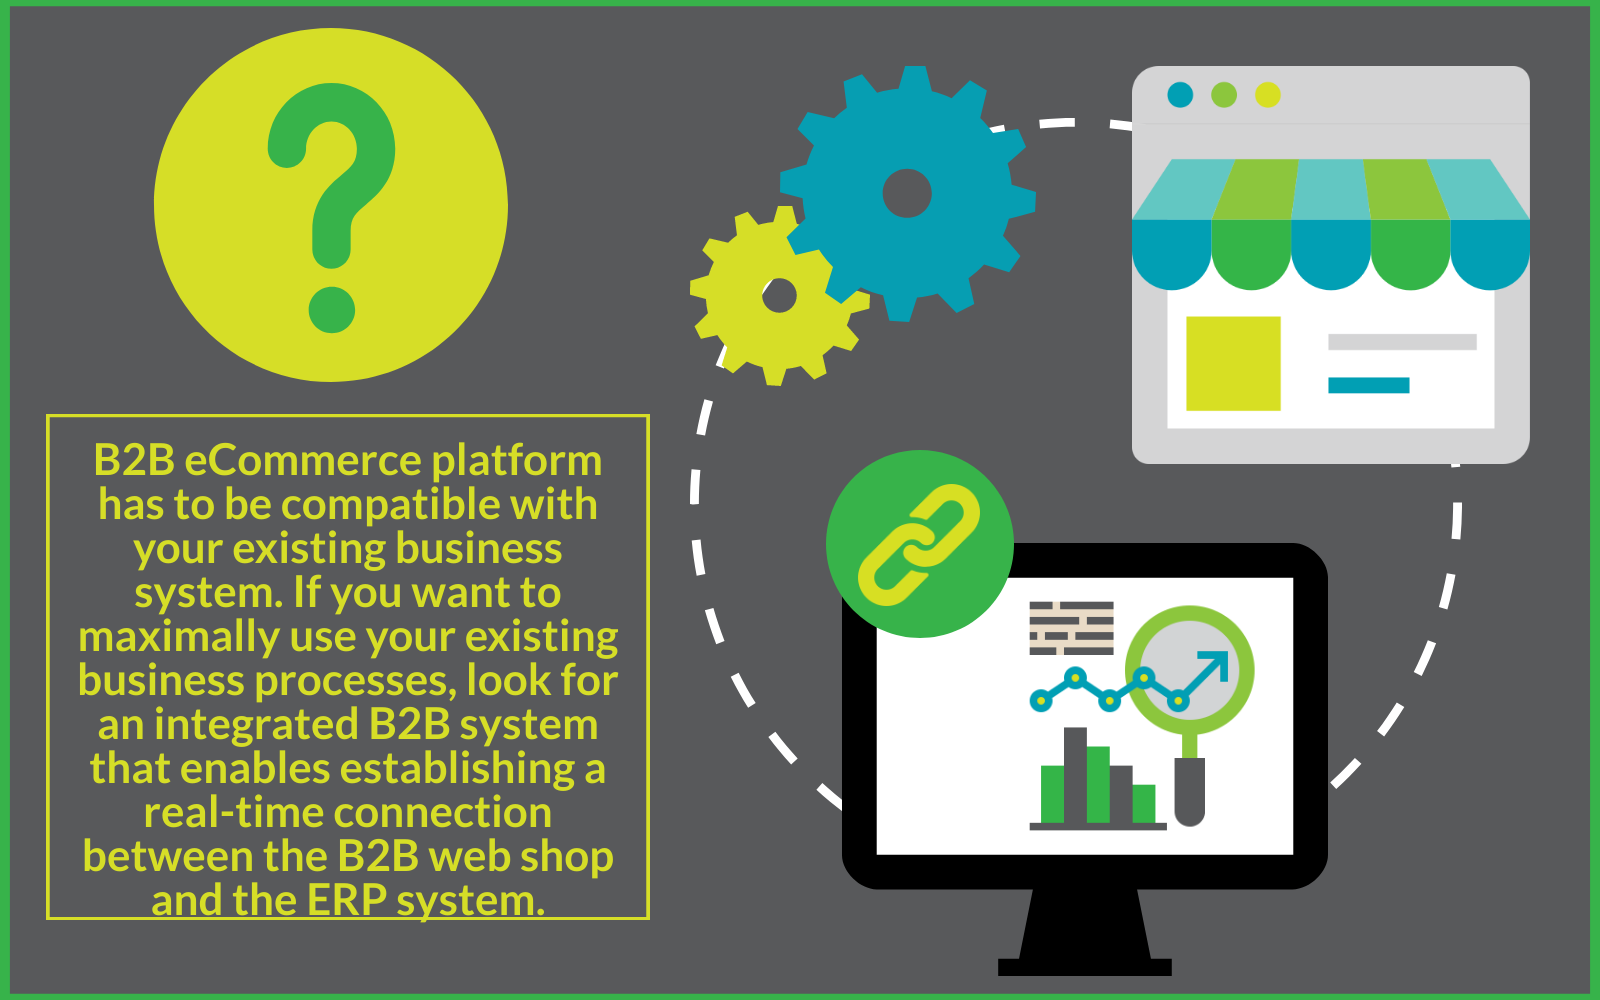 B2B ecommerc platform Hecta system